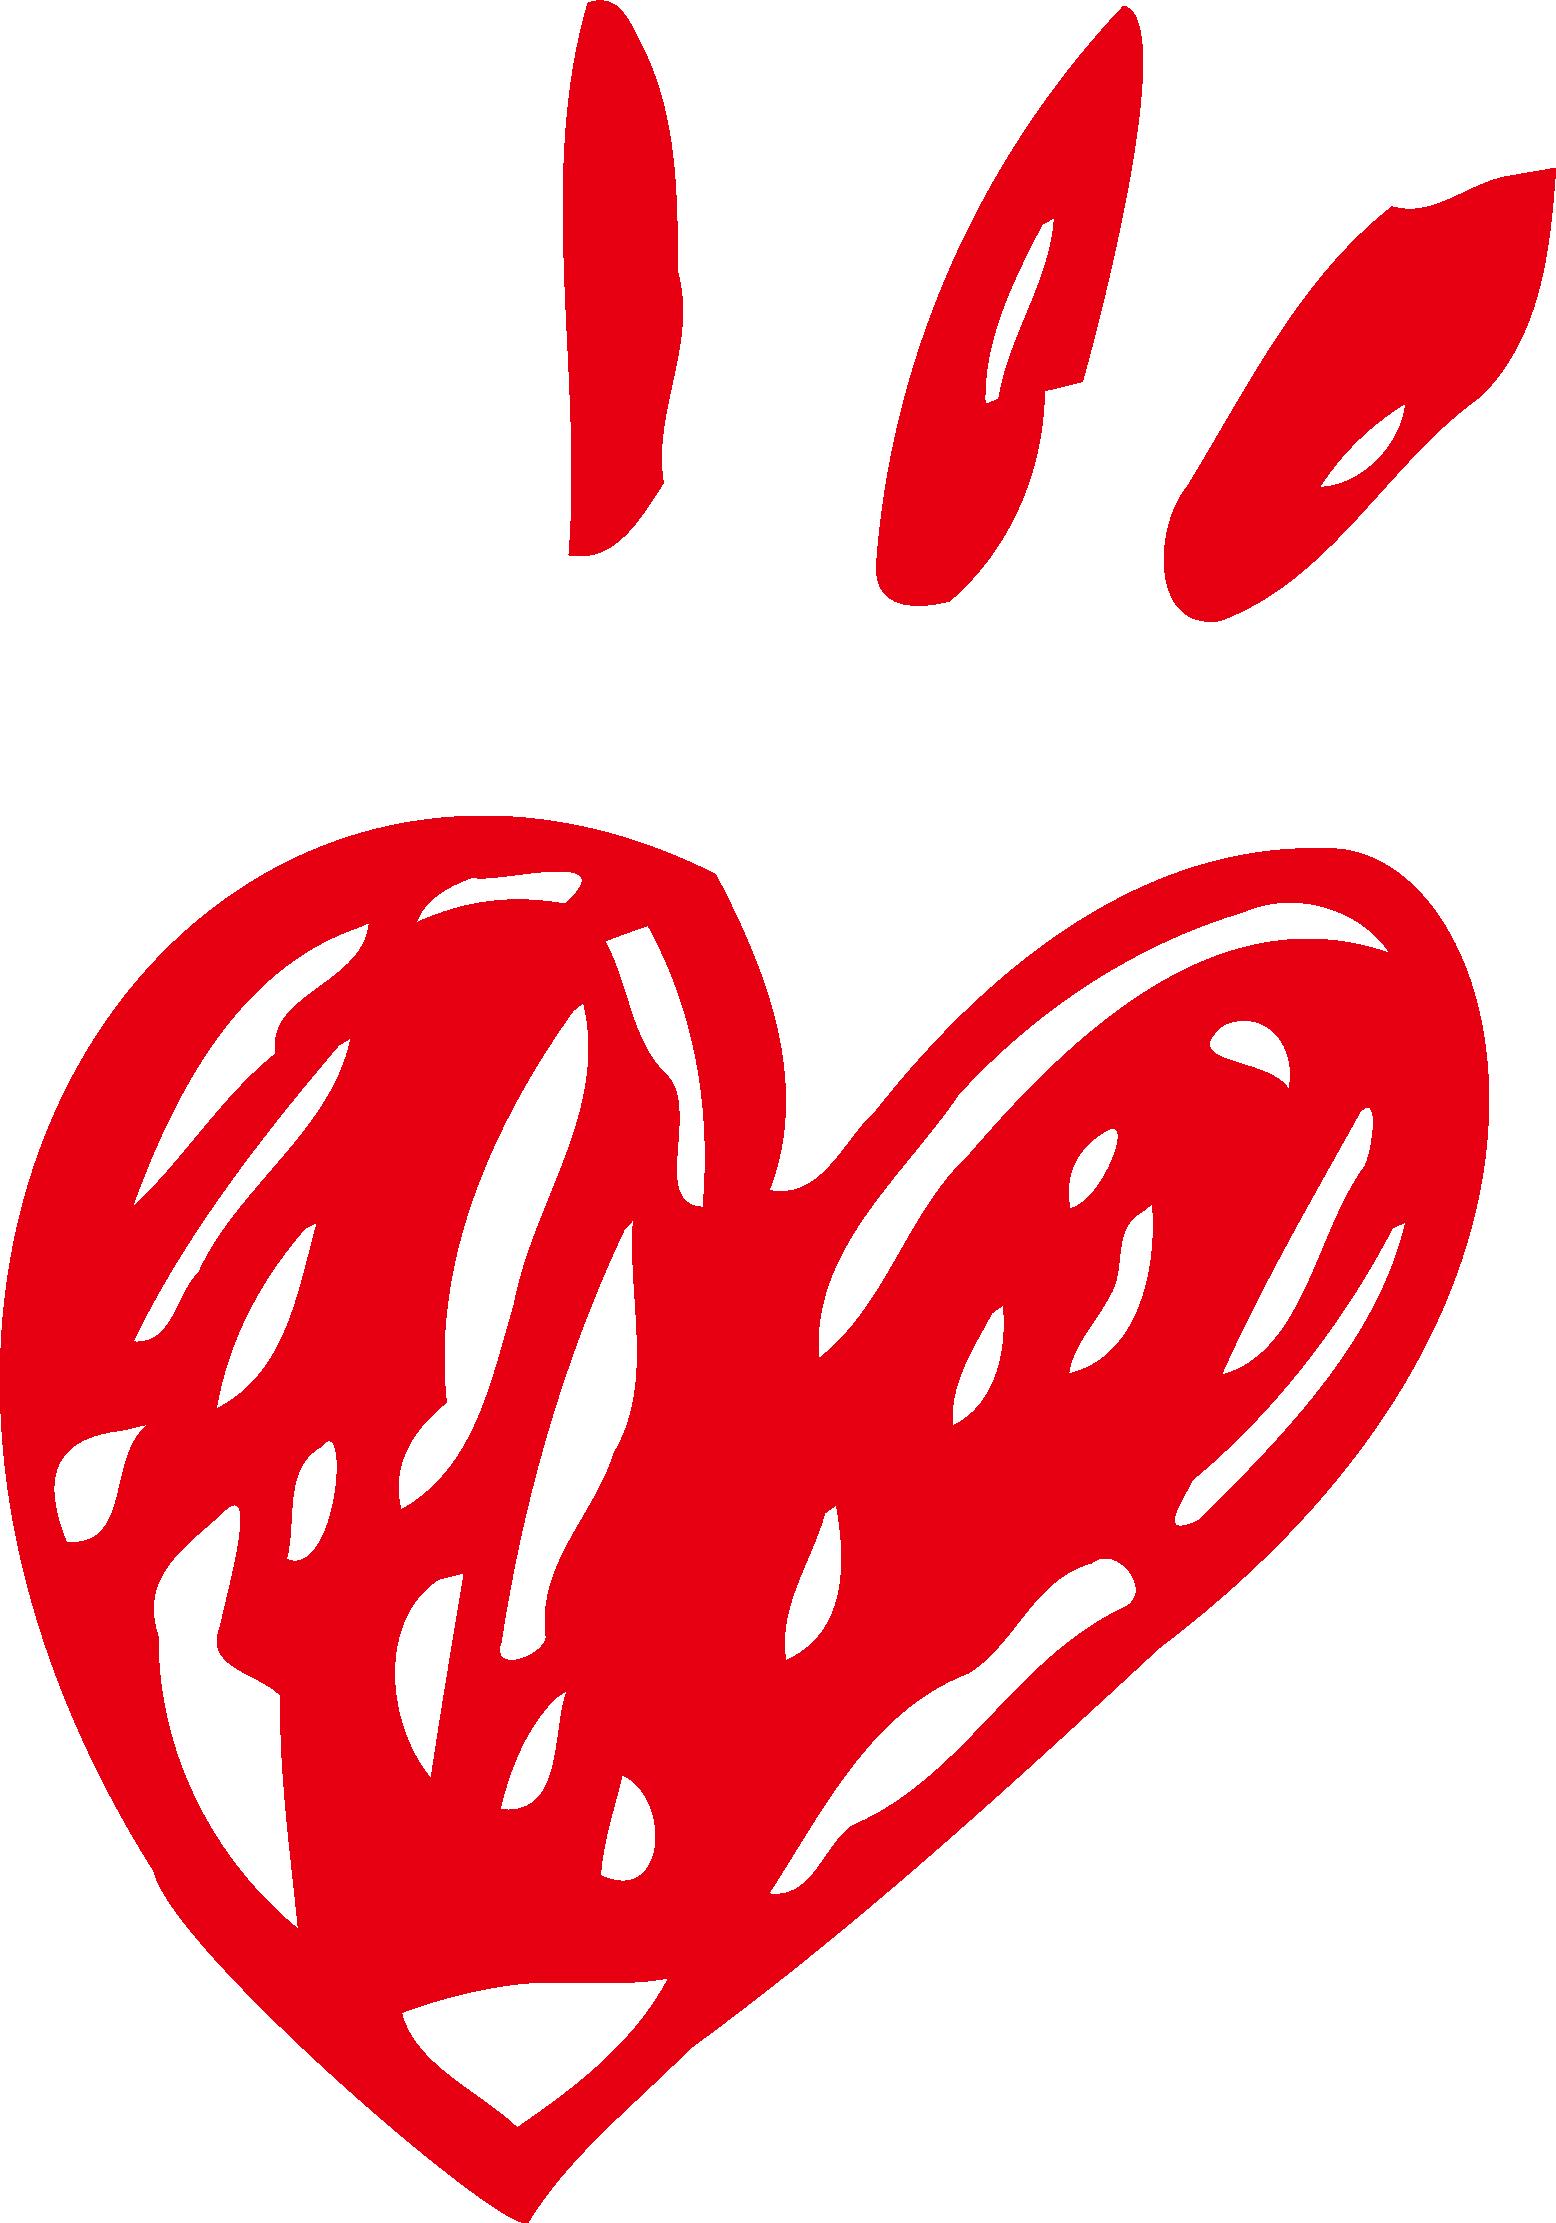 Hearts clipart crayon. Sidewalk chalk cartoon heart